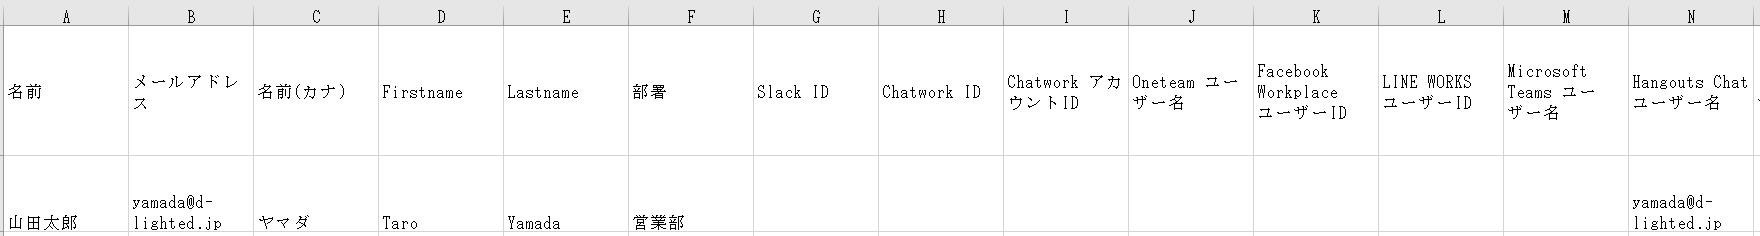 sample_stancsv_Hangouts